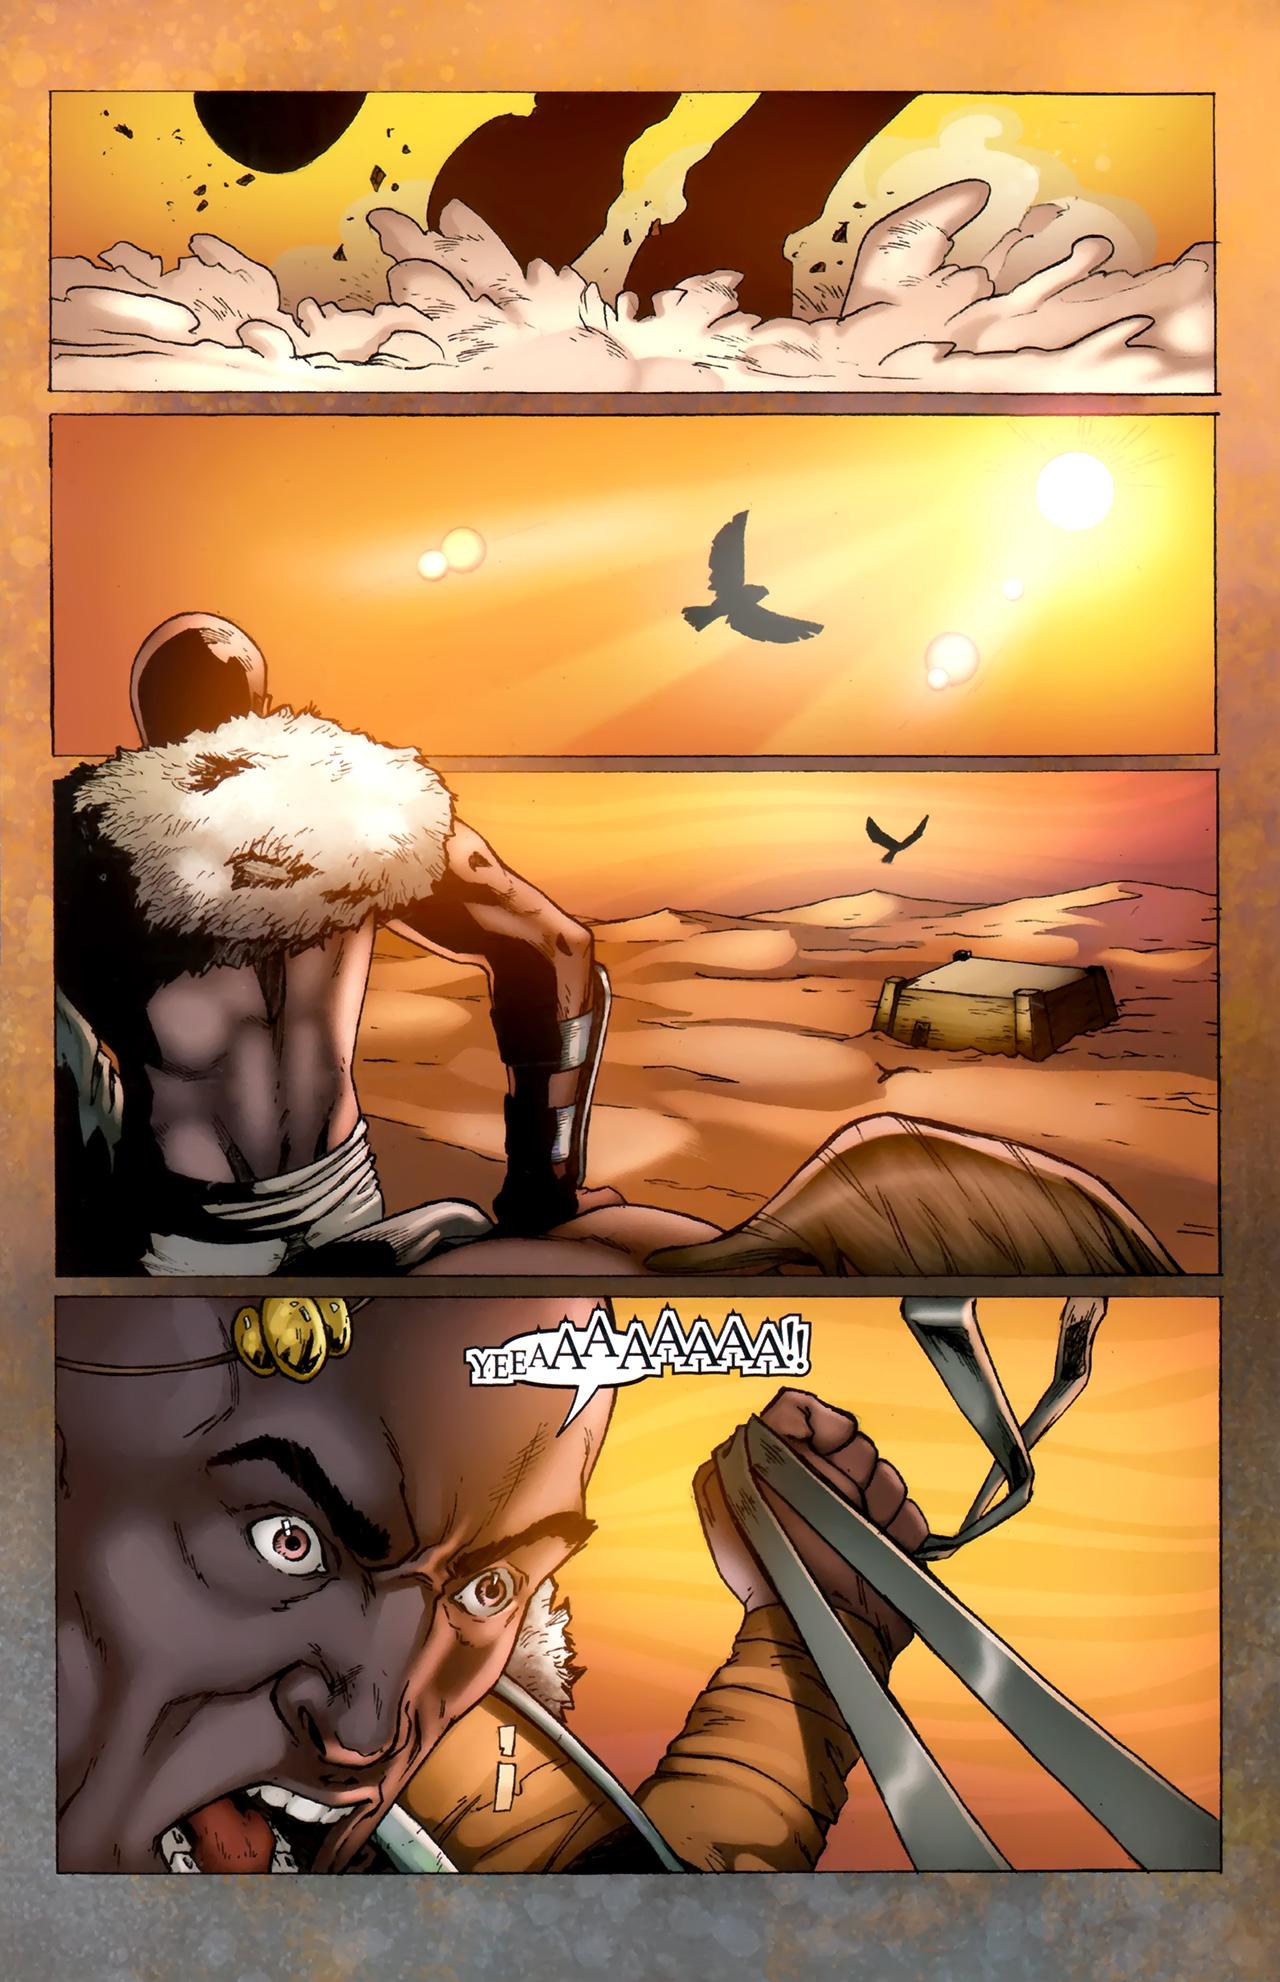 Read online 1001 Arabian Nights: The Adventures of Sinbad comic -  Issue #11 - 10